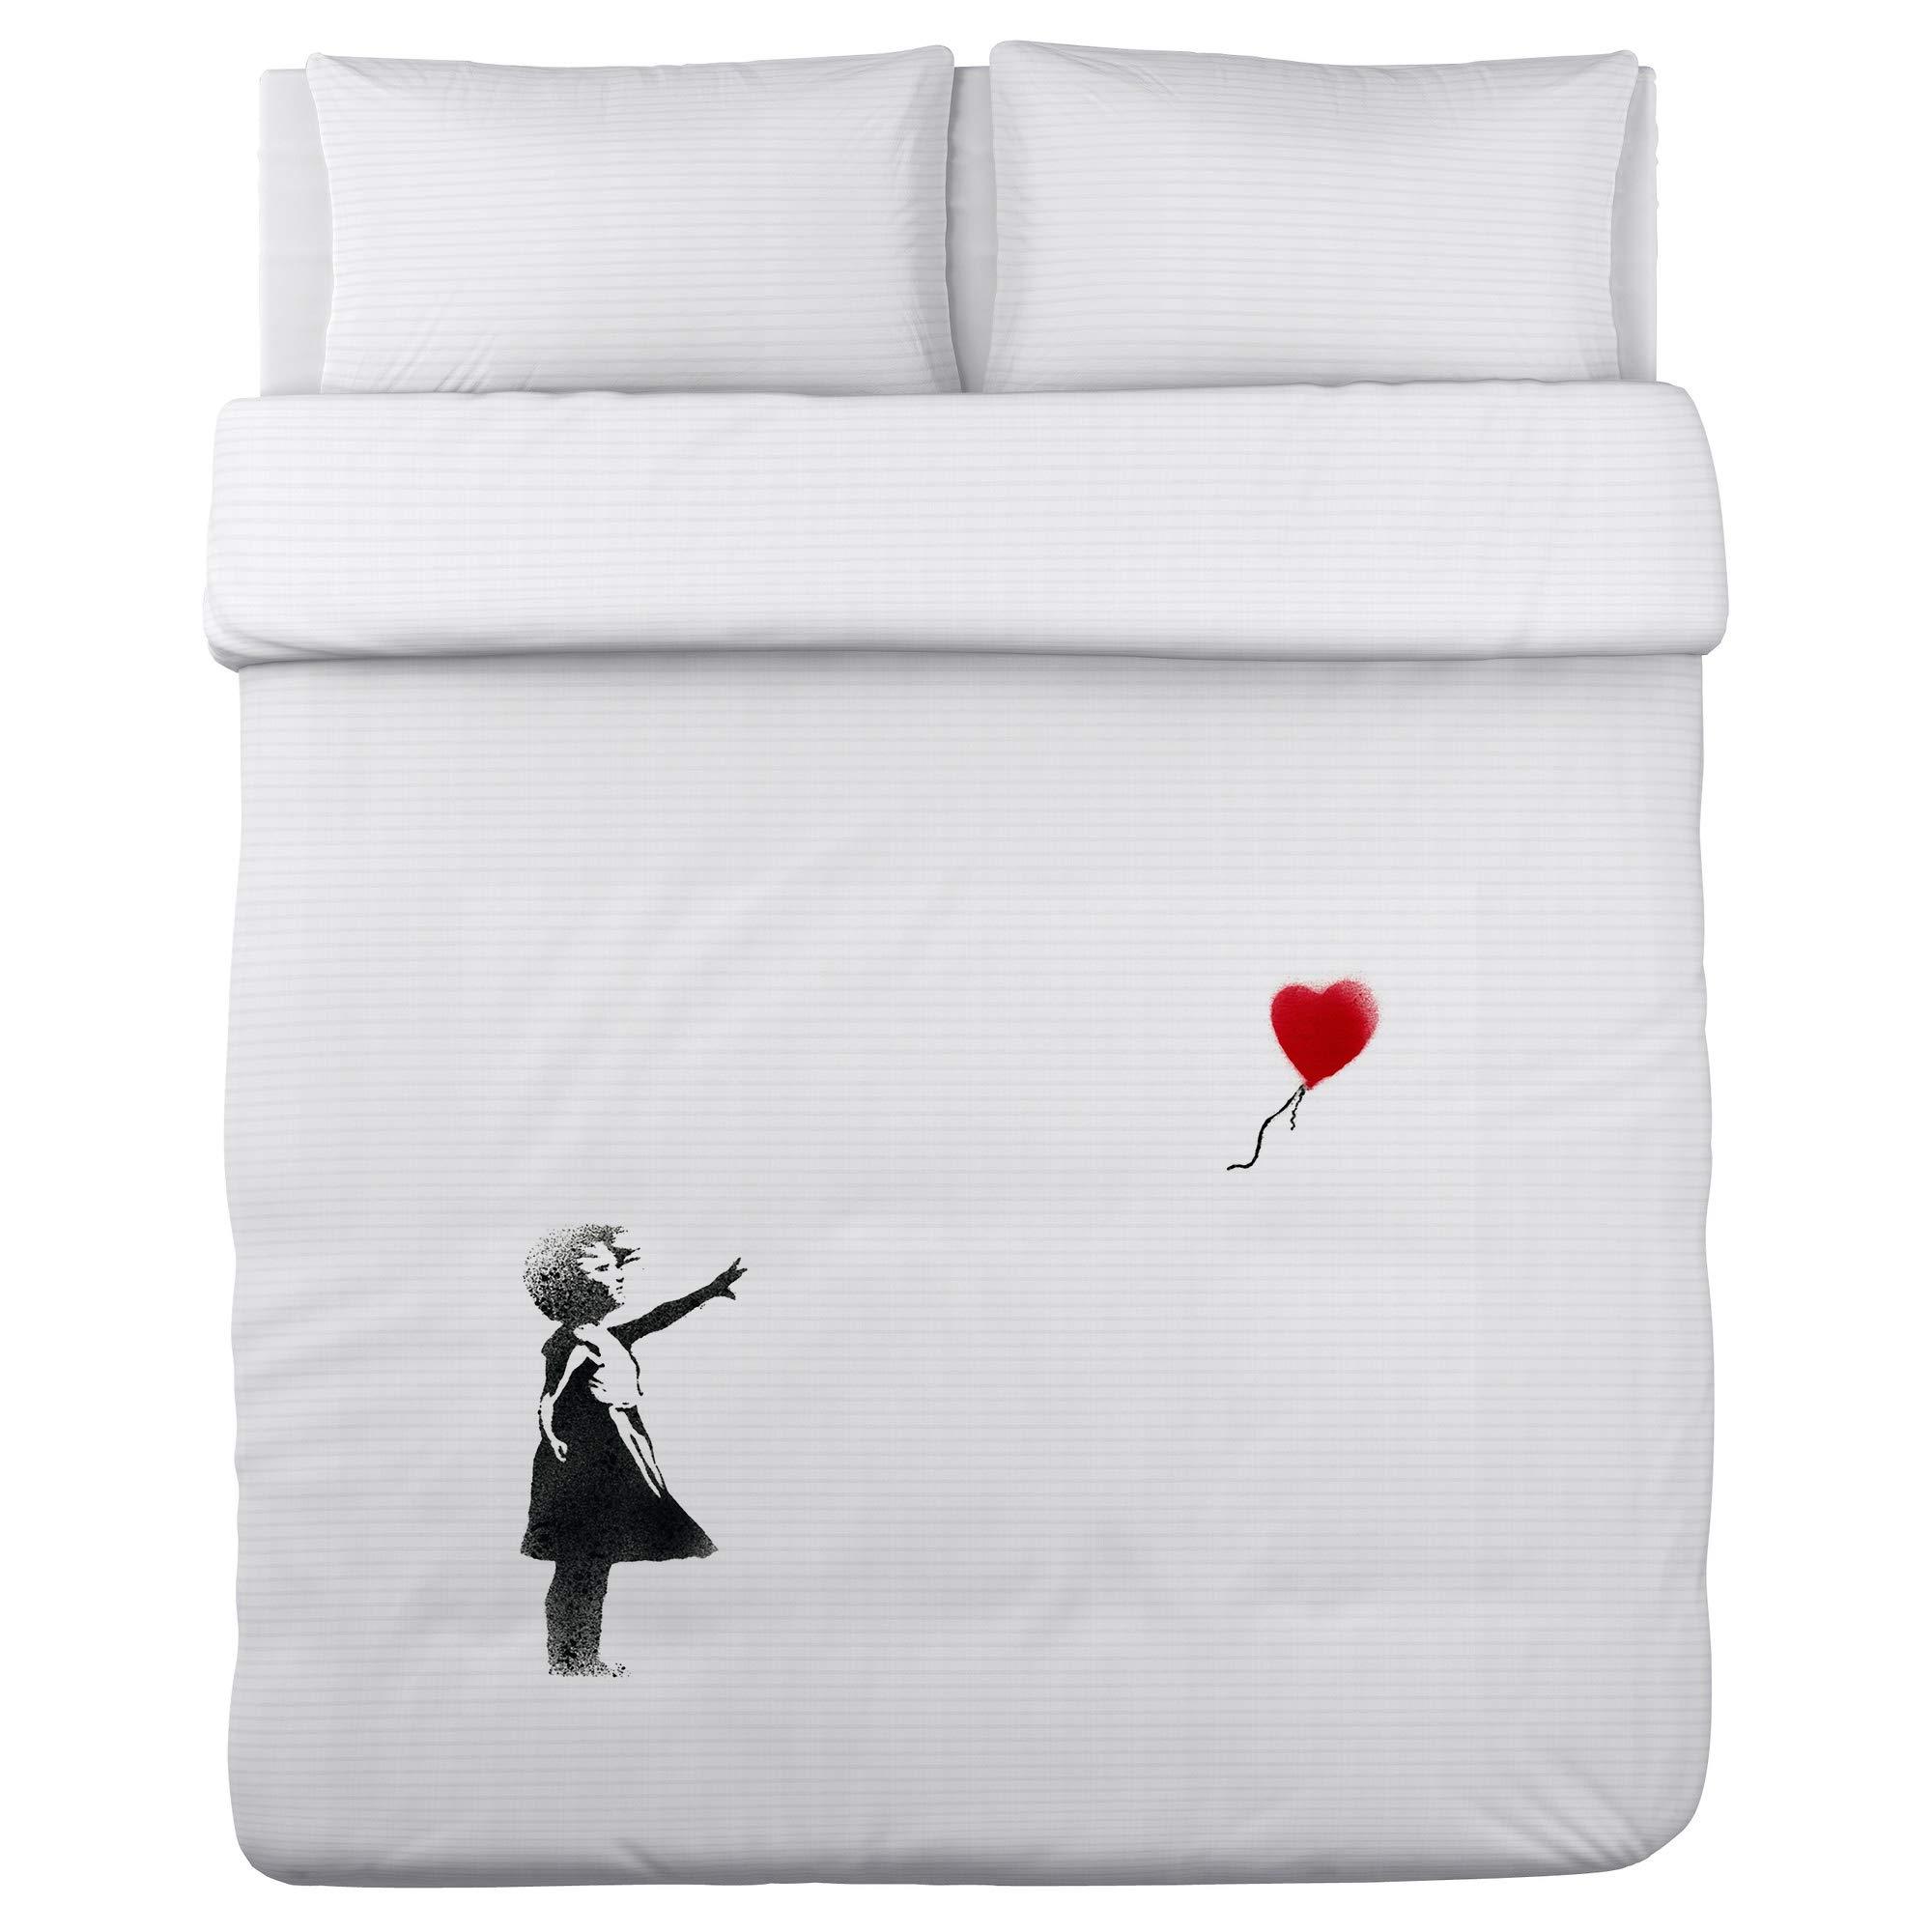 ArtFuzz Girl Chasing Heart - Black Red Duvet Cover by Banksy 104 X 88